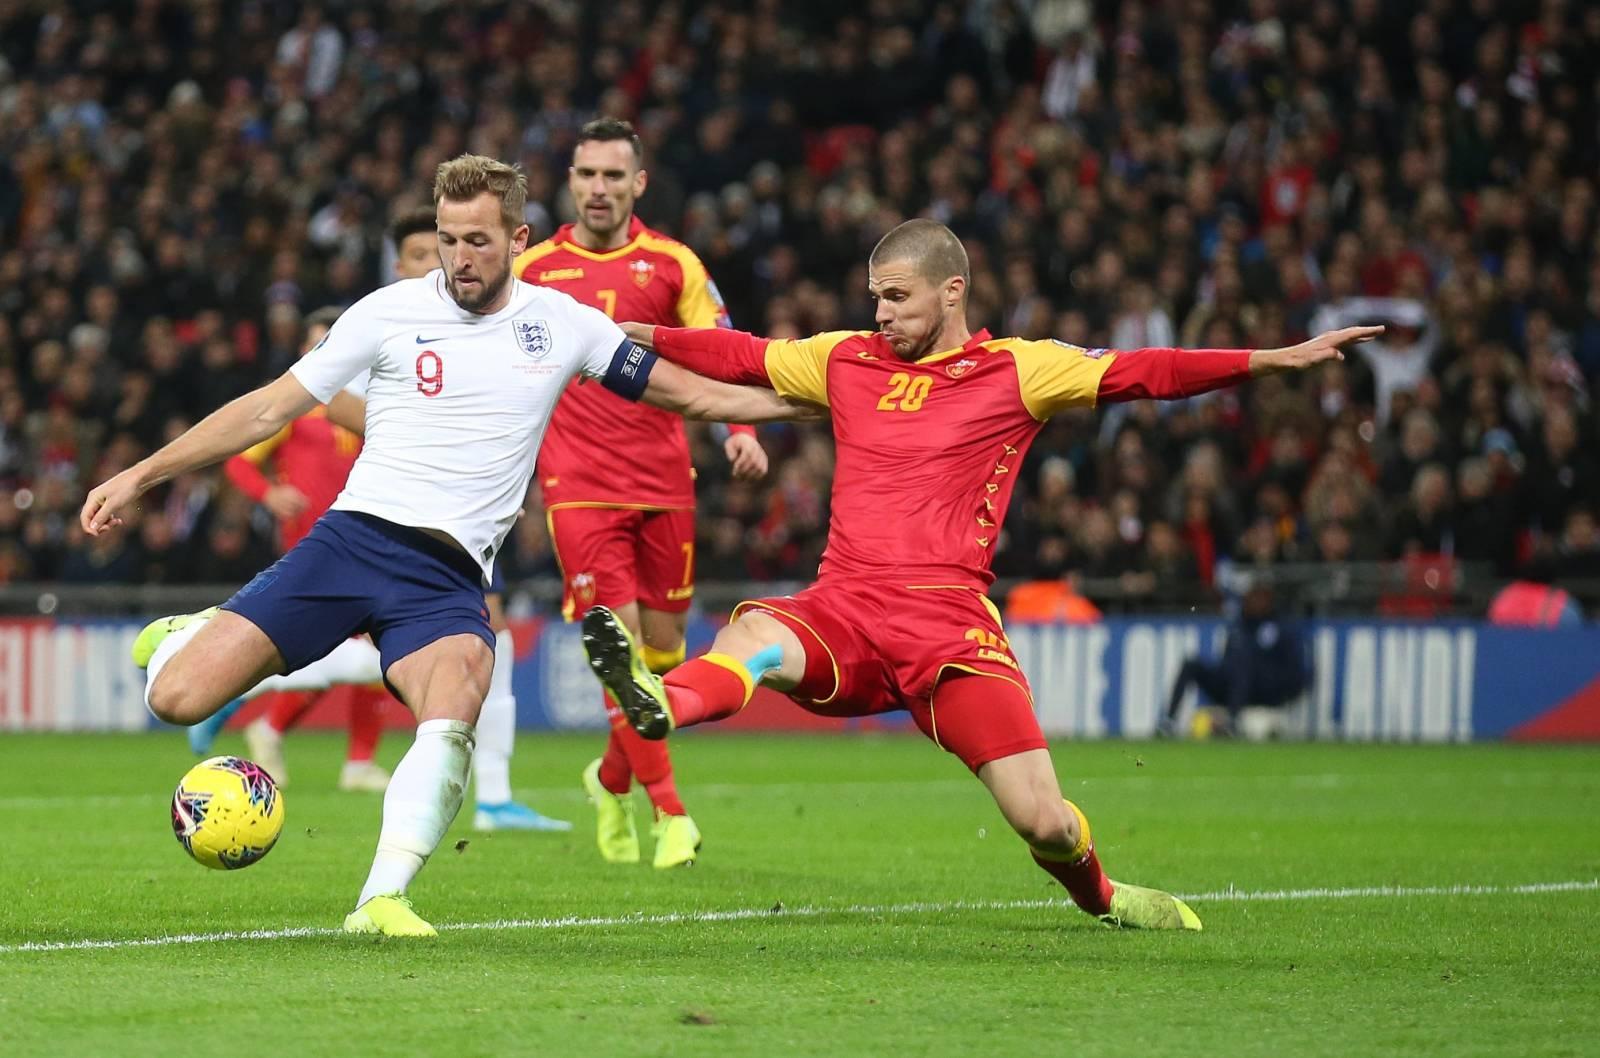 ebg, UEFA EM Qualifikation, England vs Montenegro